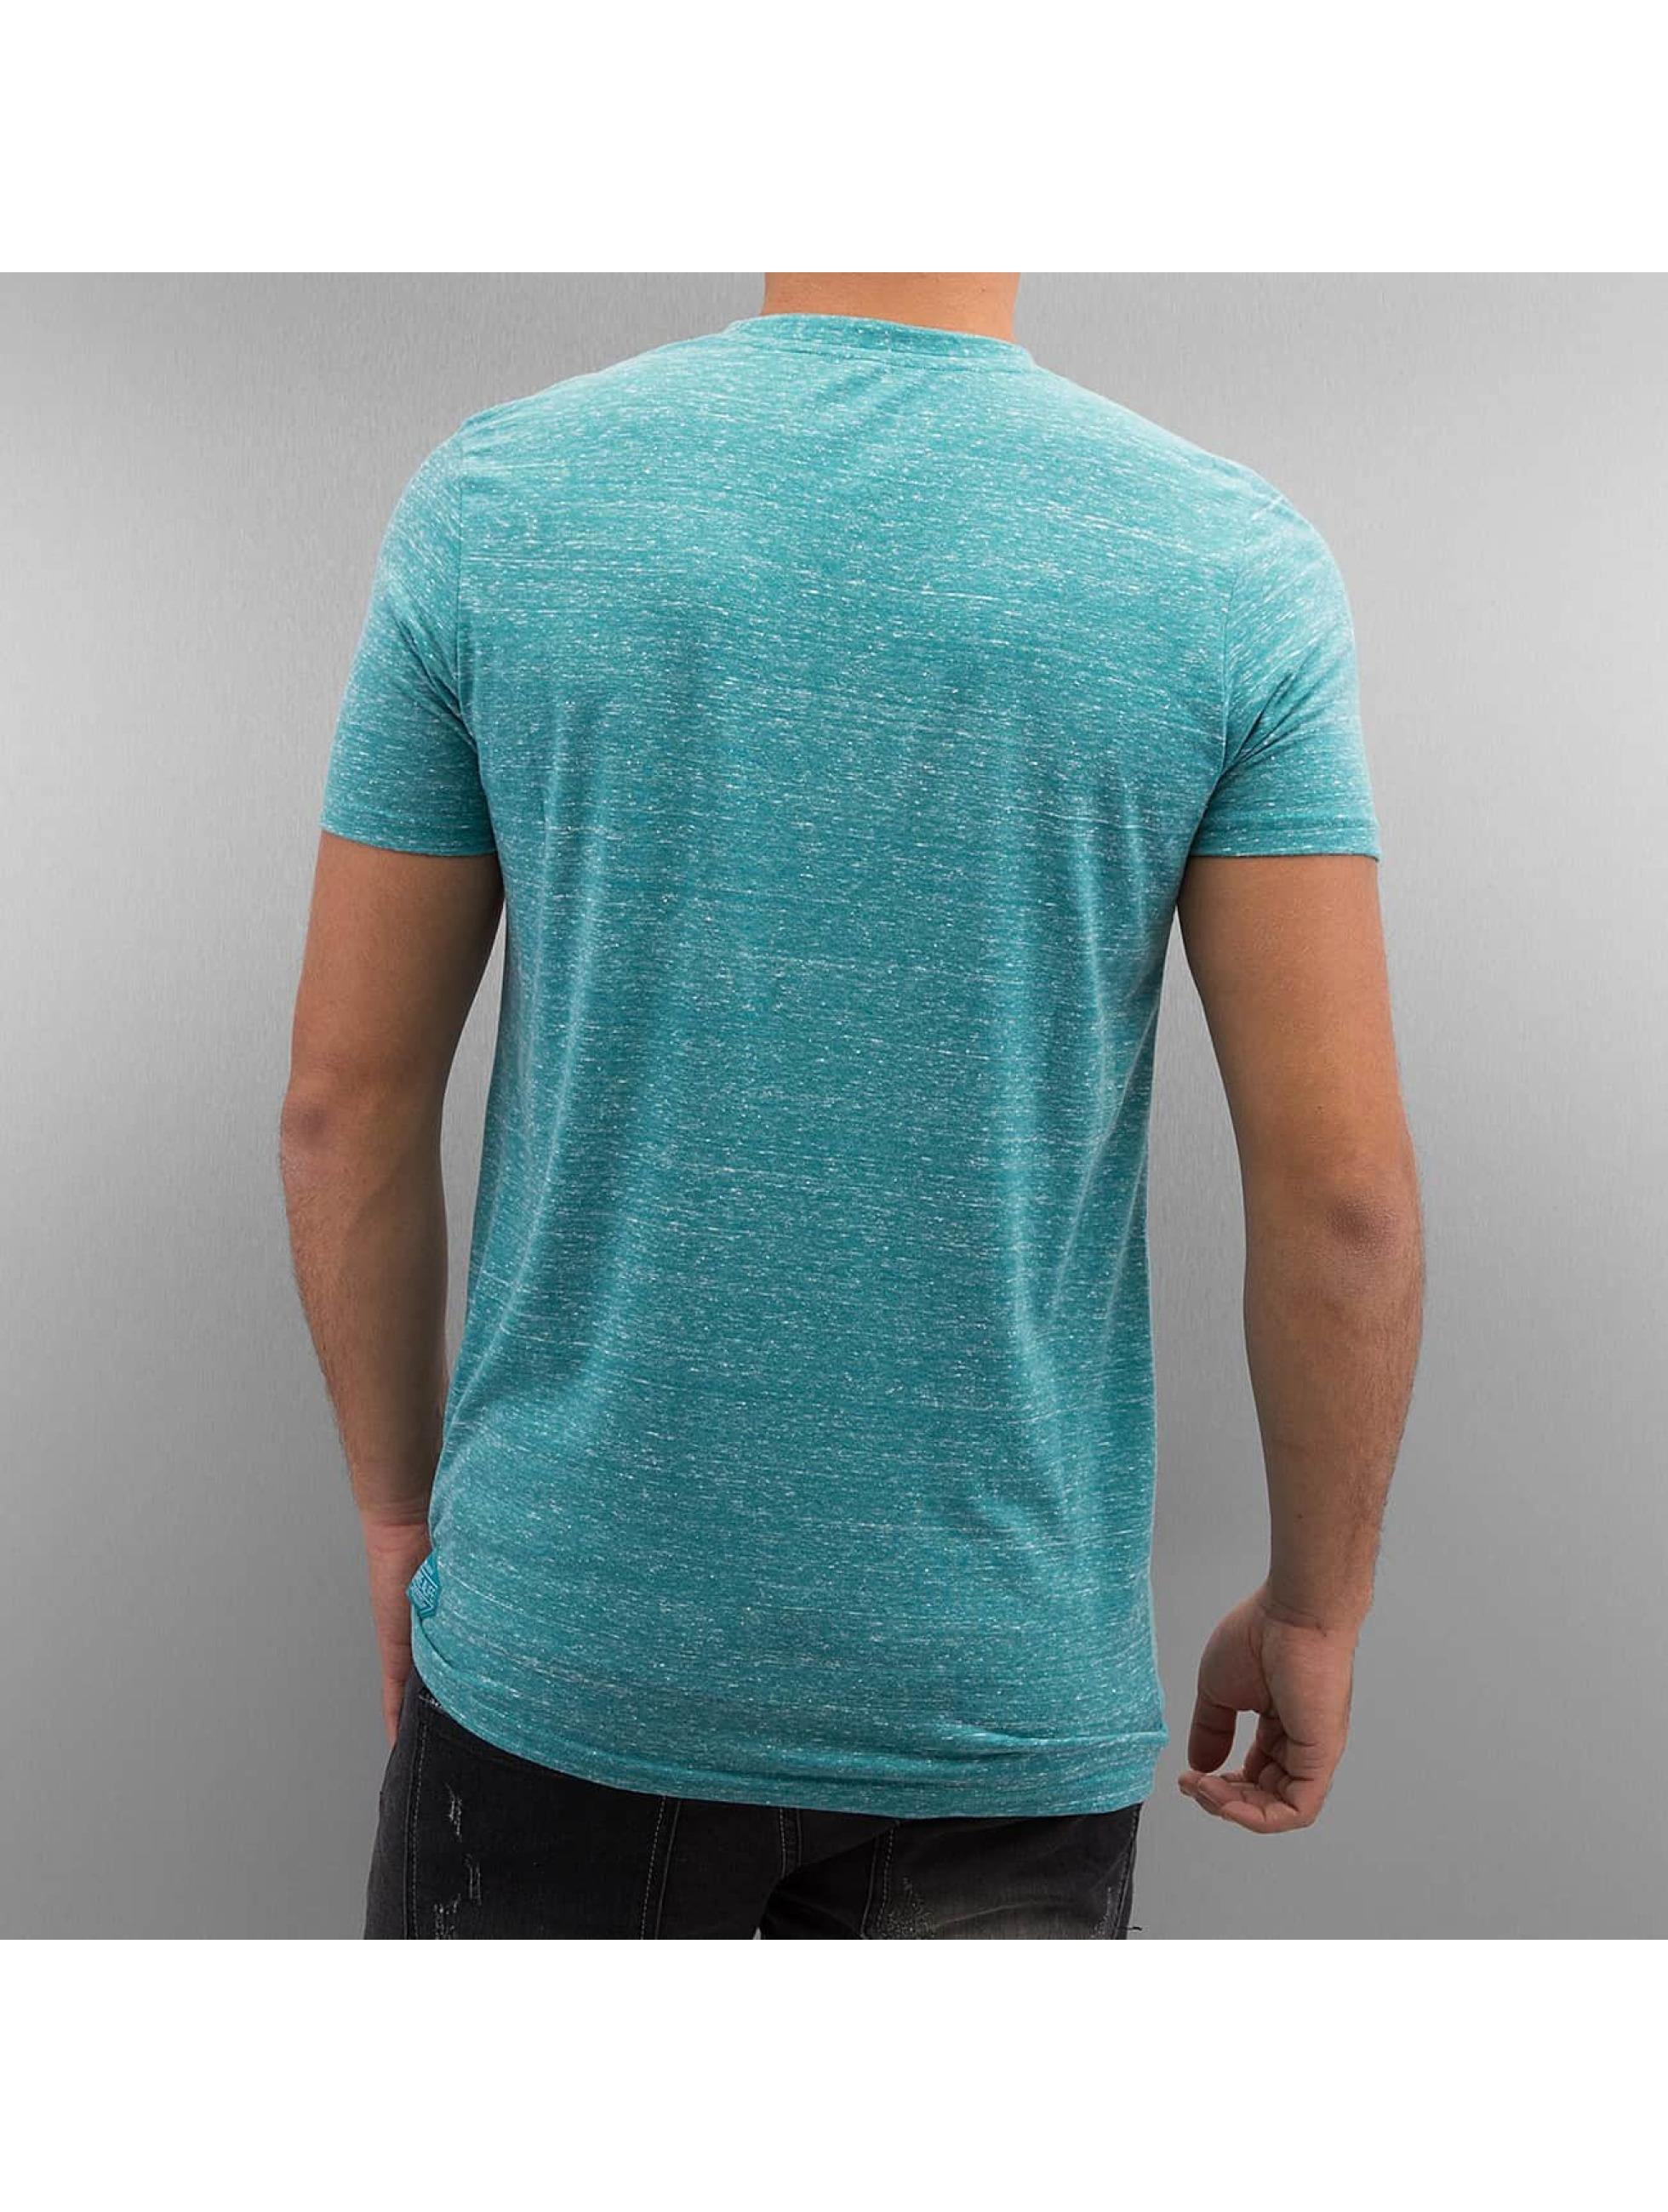 Alife & Kickin t-shirt Vin A turquois